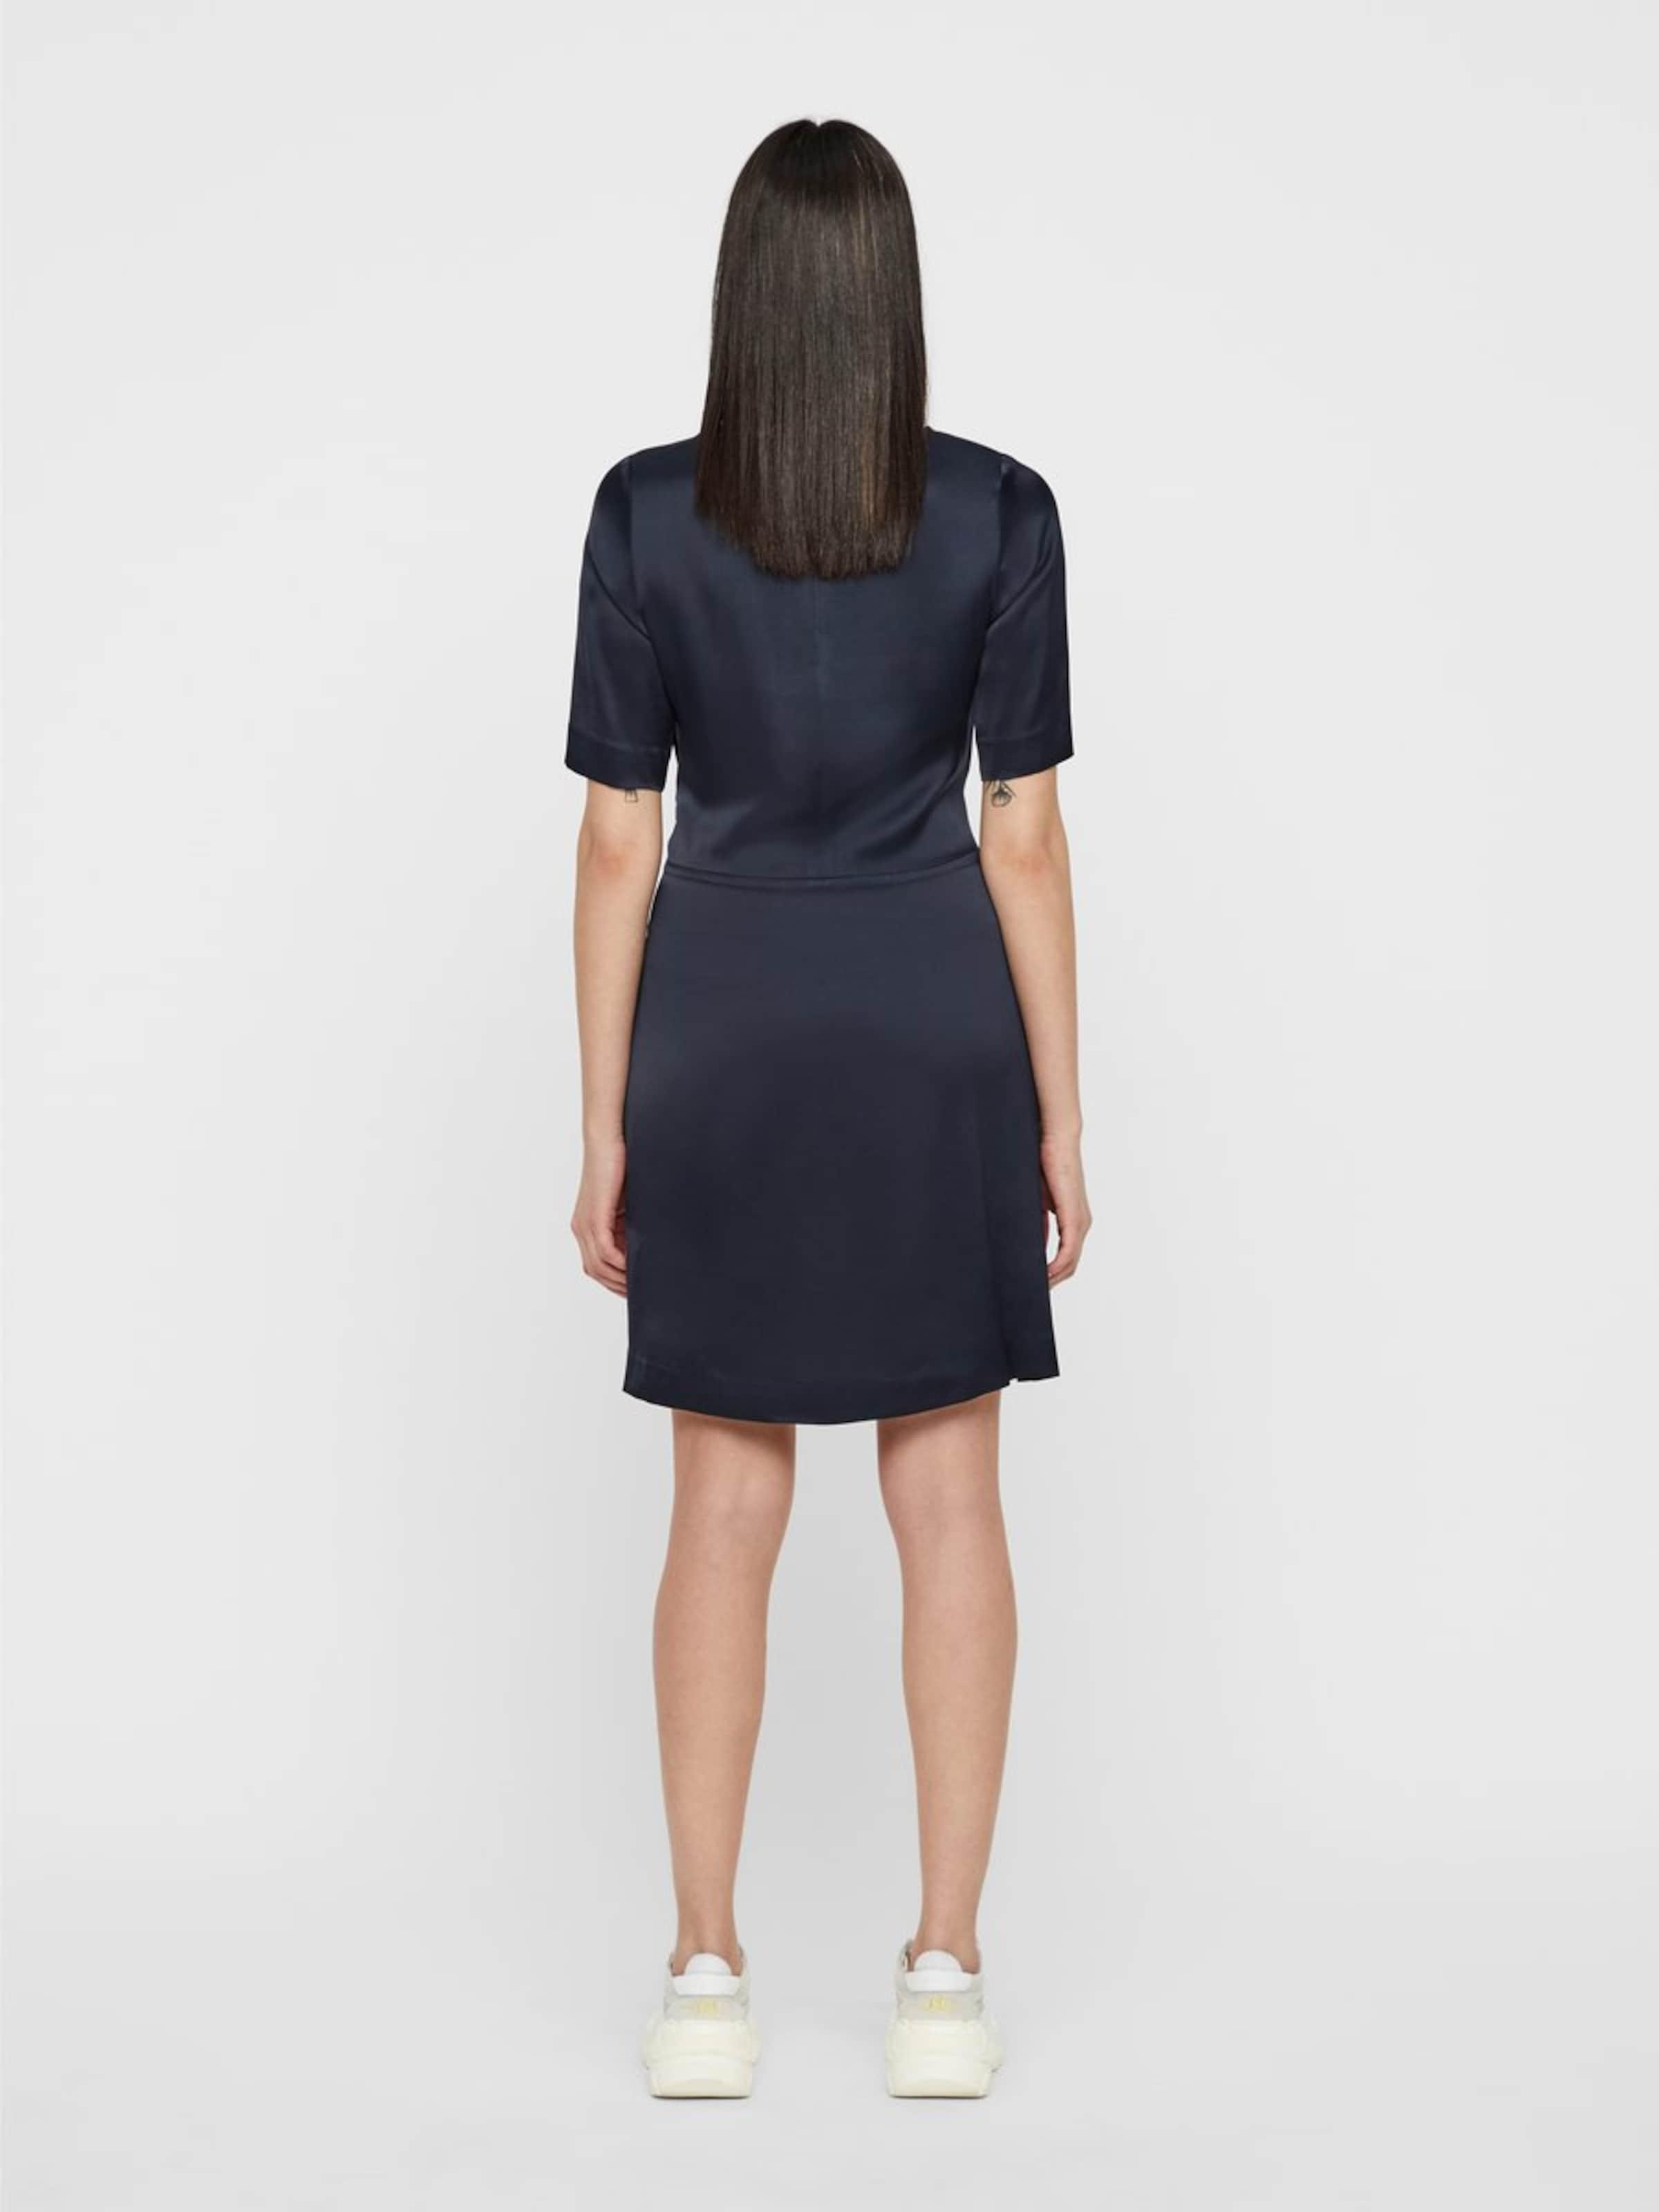 'embla lindeberg J In Liquid' Nachtblau Kleid vwN8nO0m